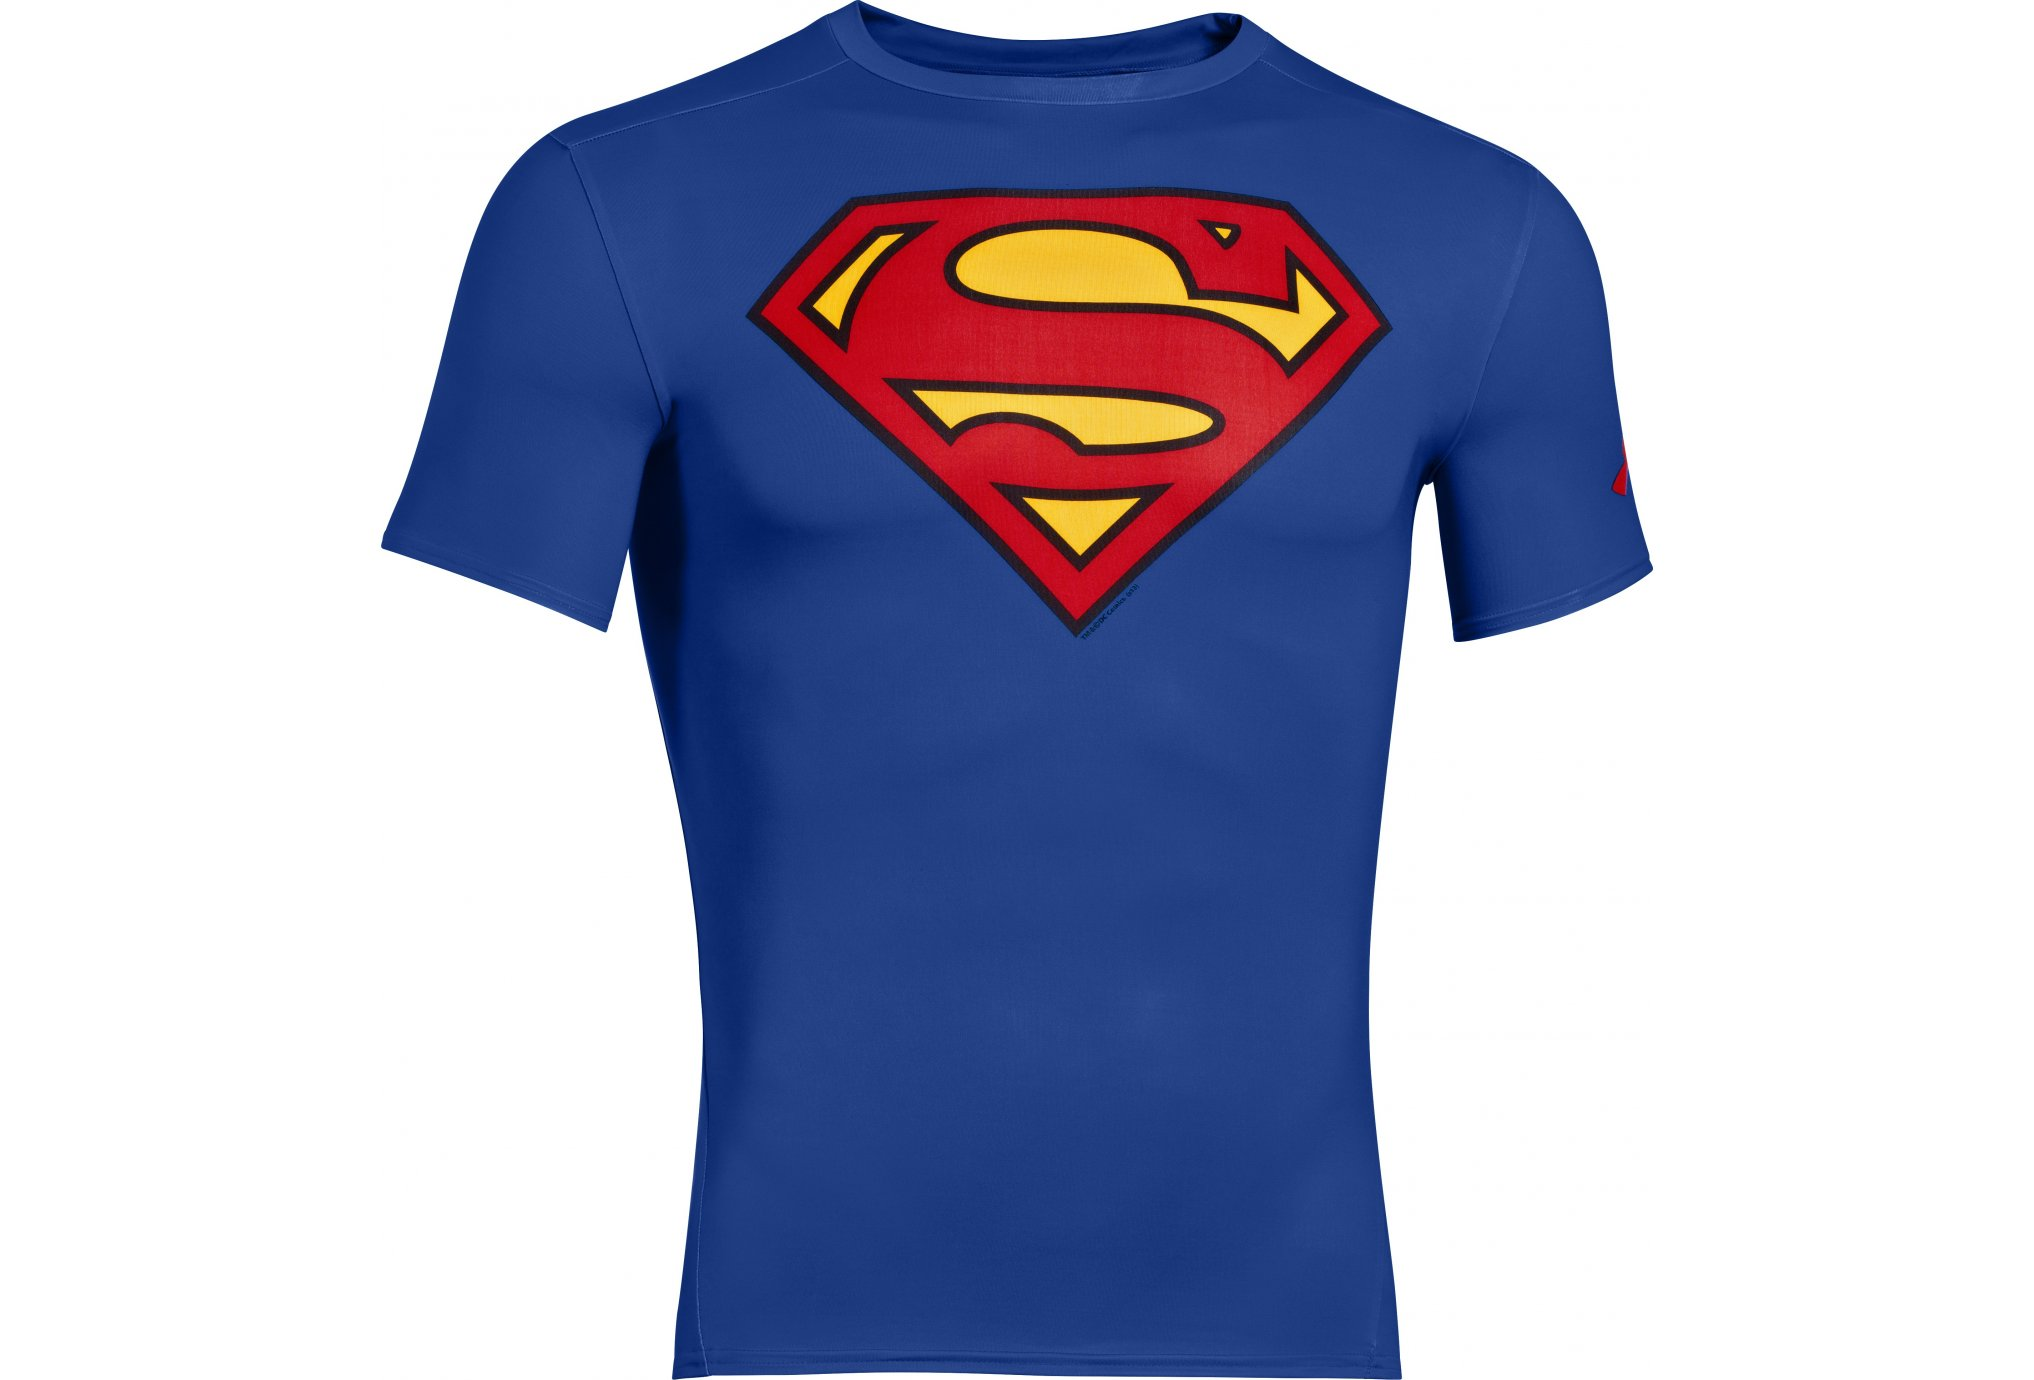 Under Armour Alter Ego Superman M vêtement running homme